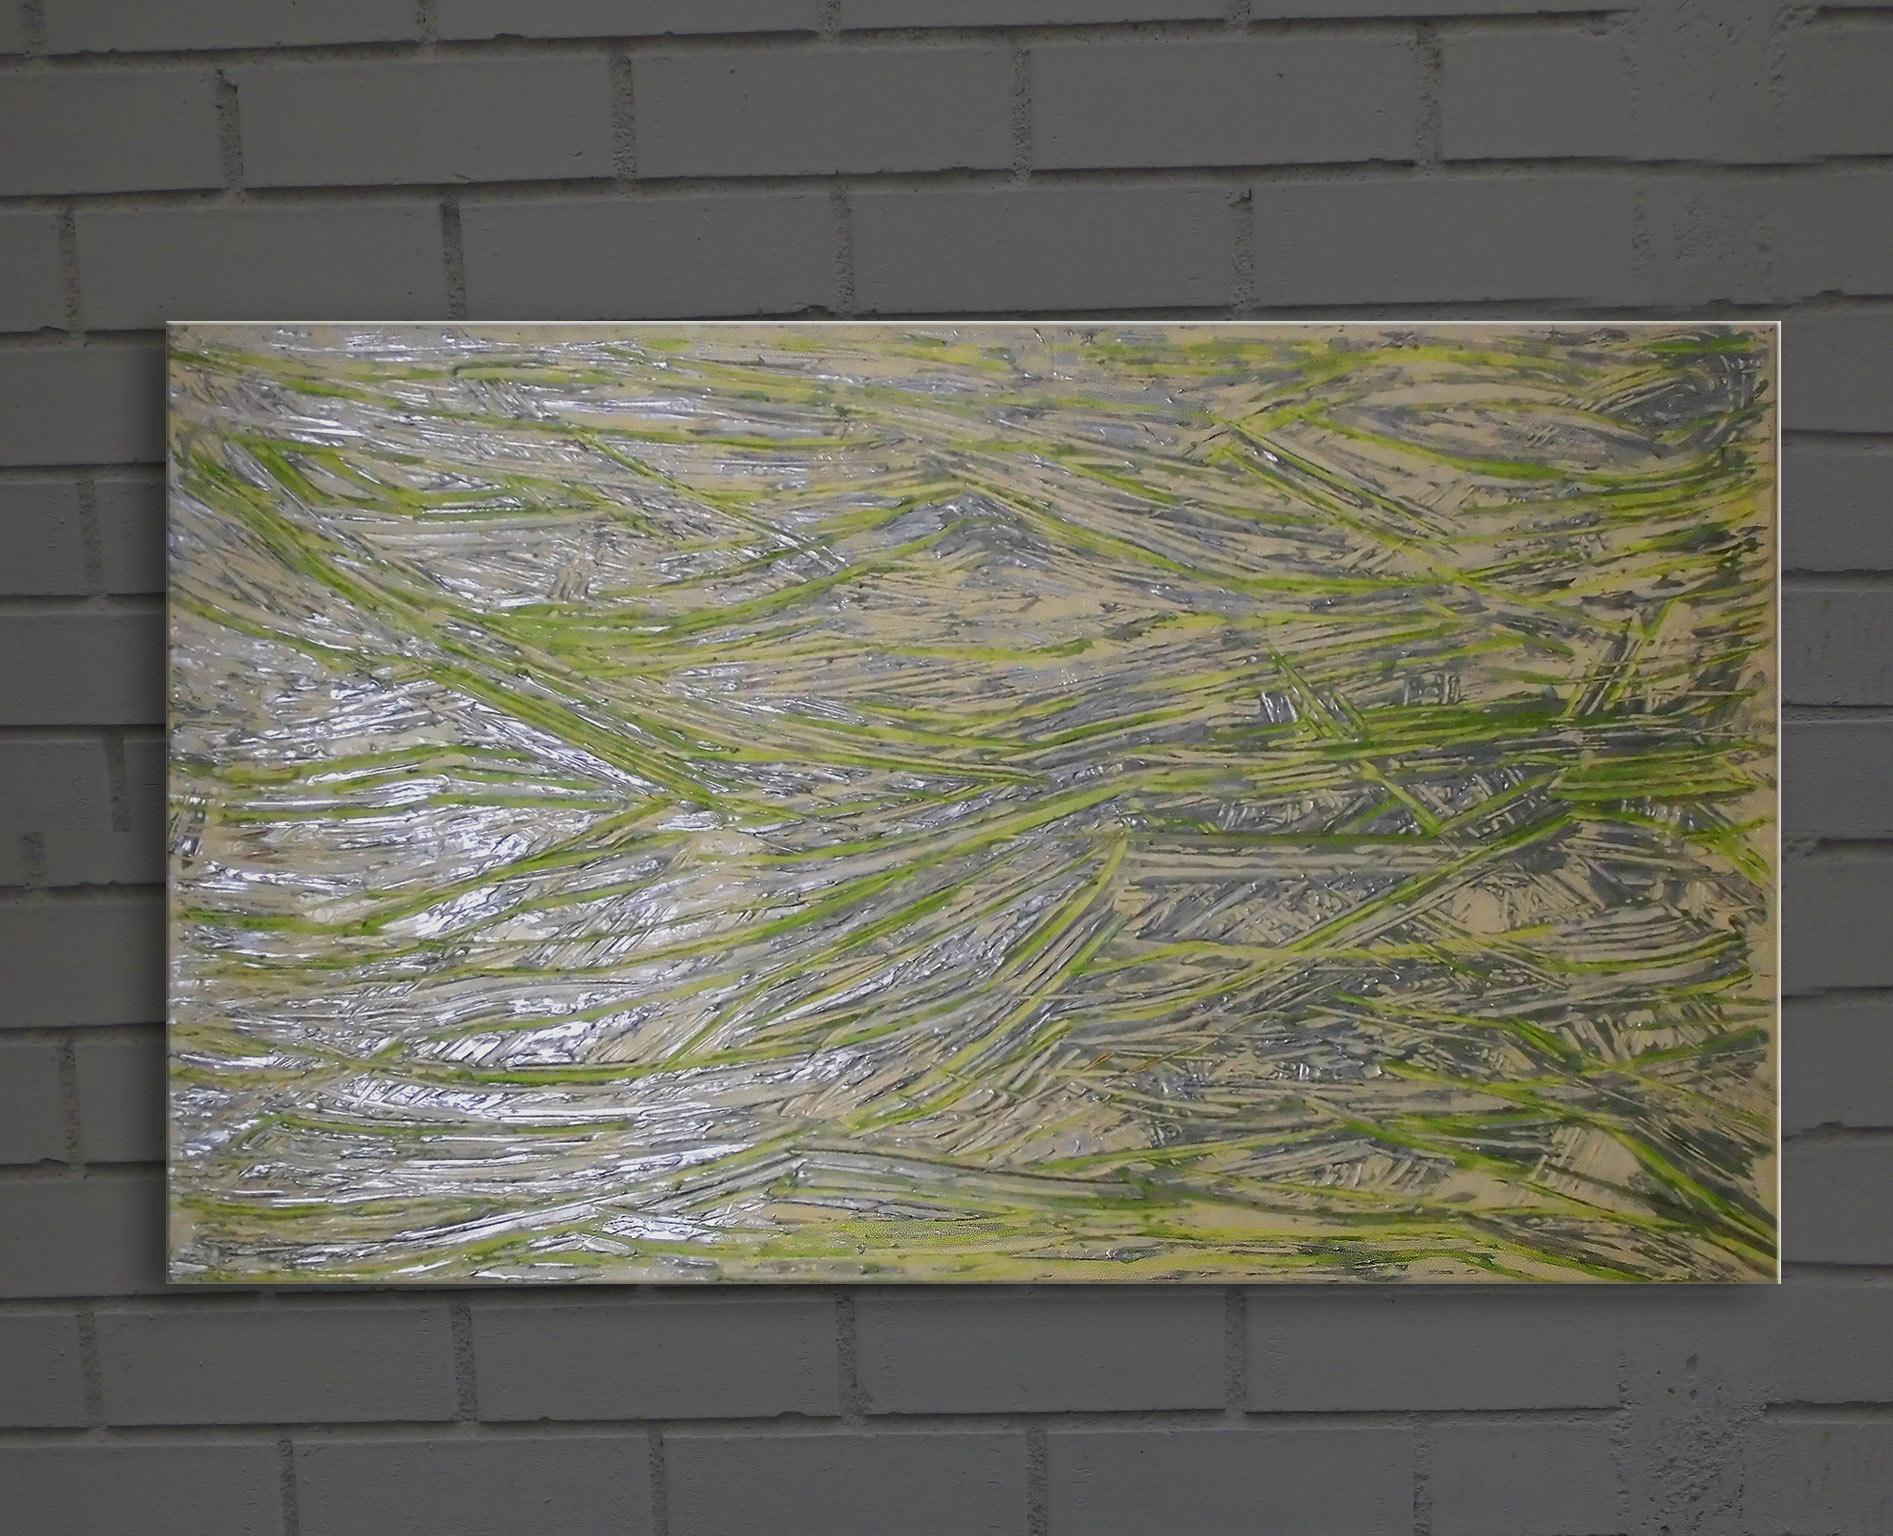 kunst gem lde original leinwand bilder online kaufen malerei bad soden taunus. Black Bedroom Furniture Sets. Home Design Ideas